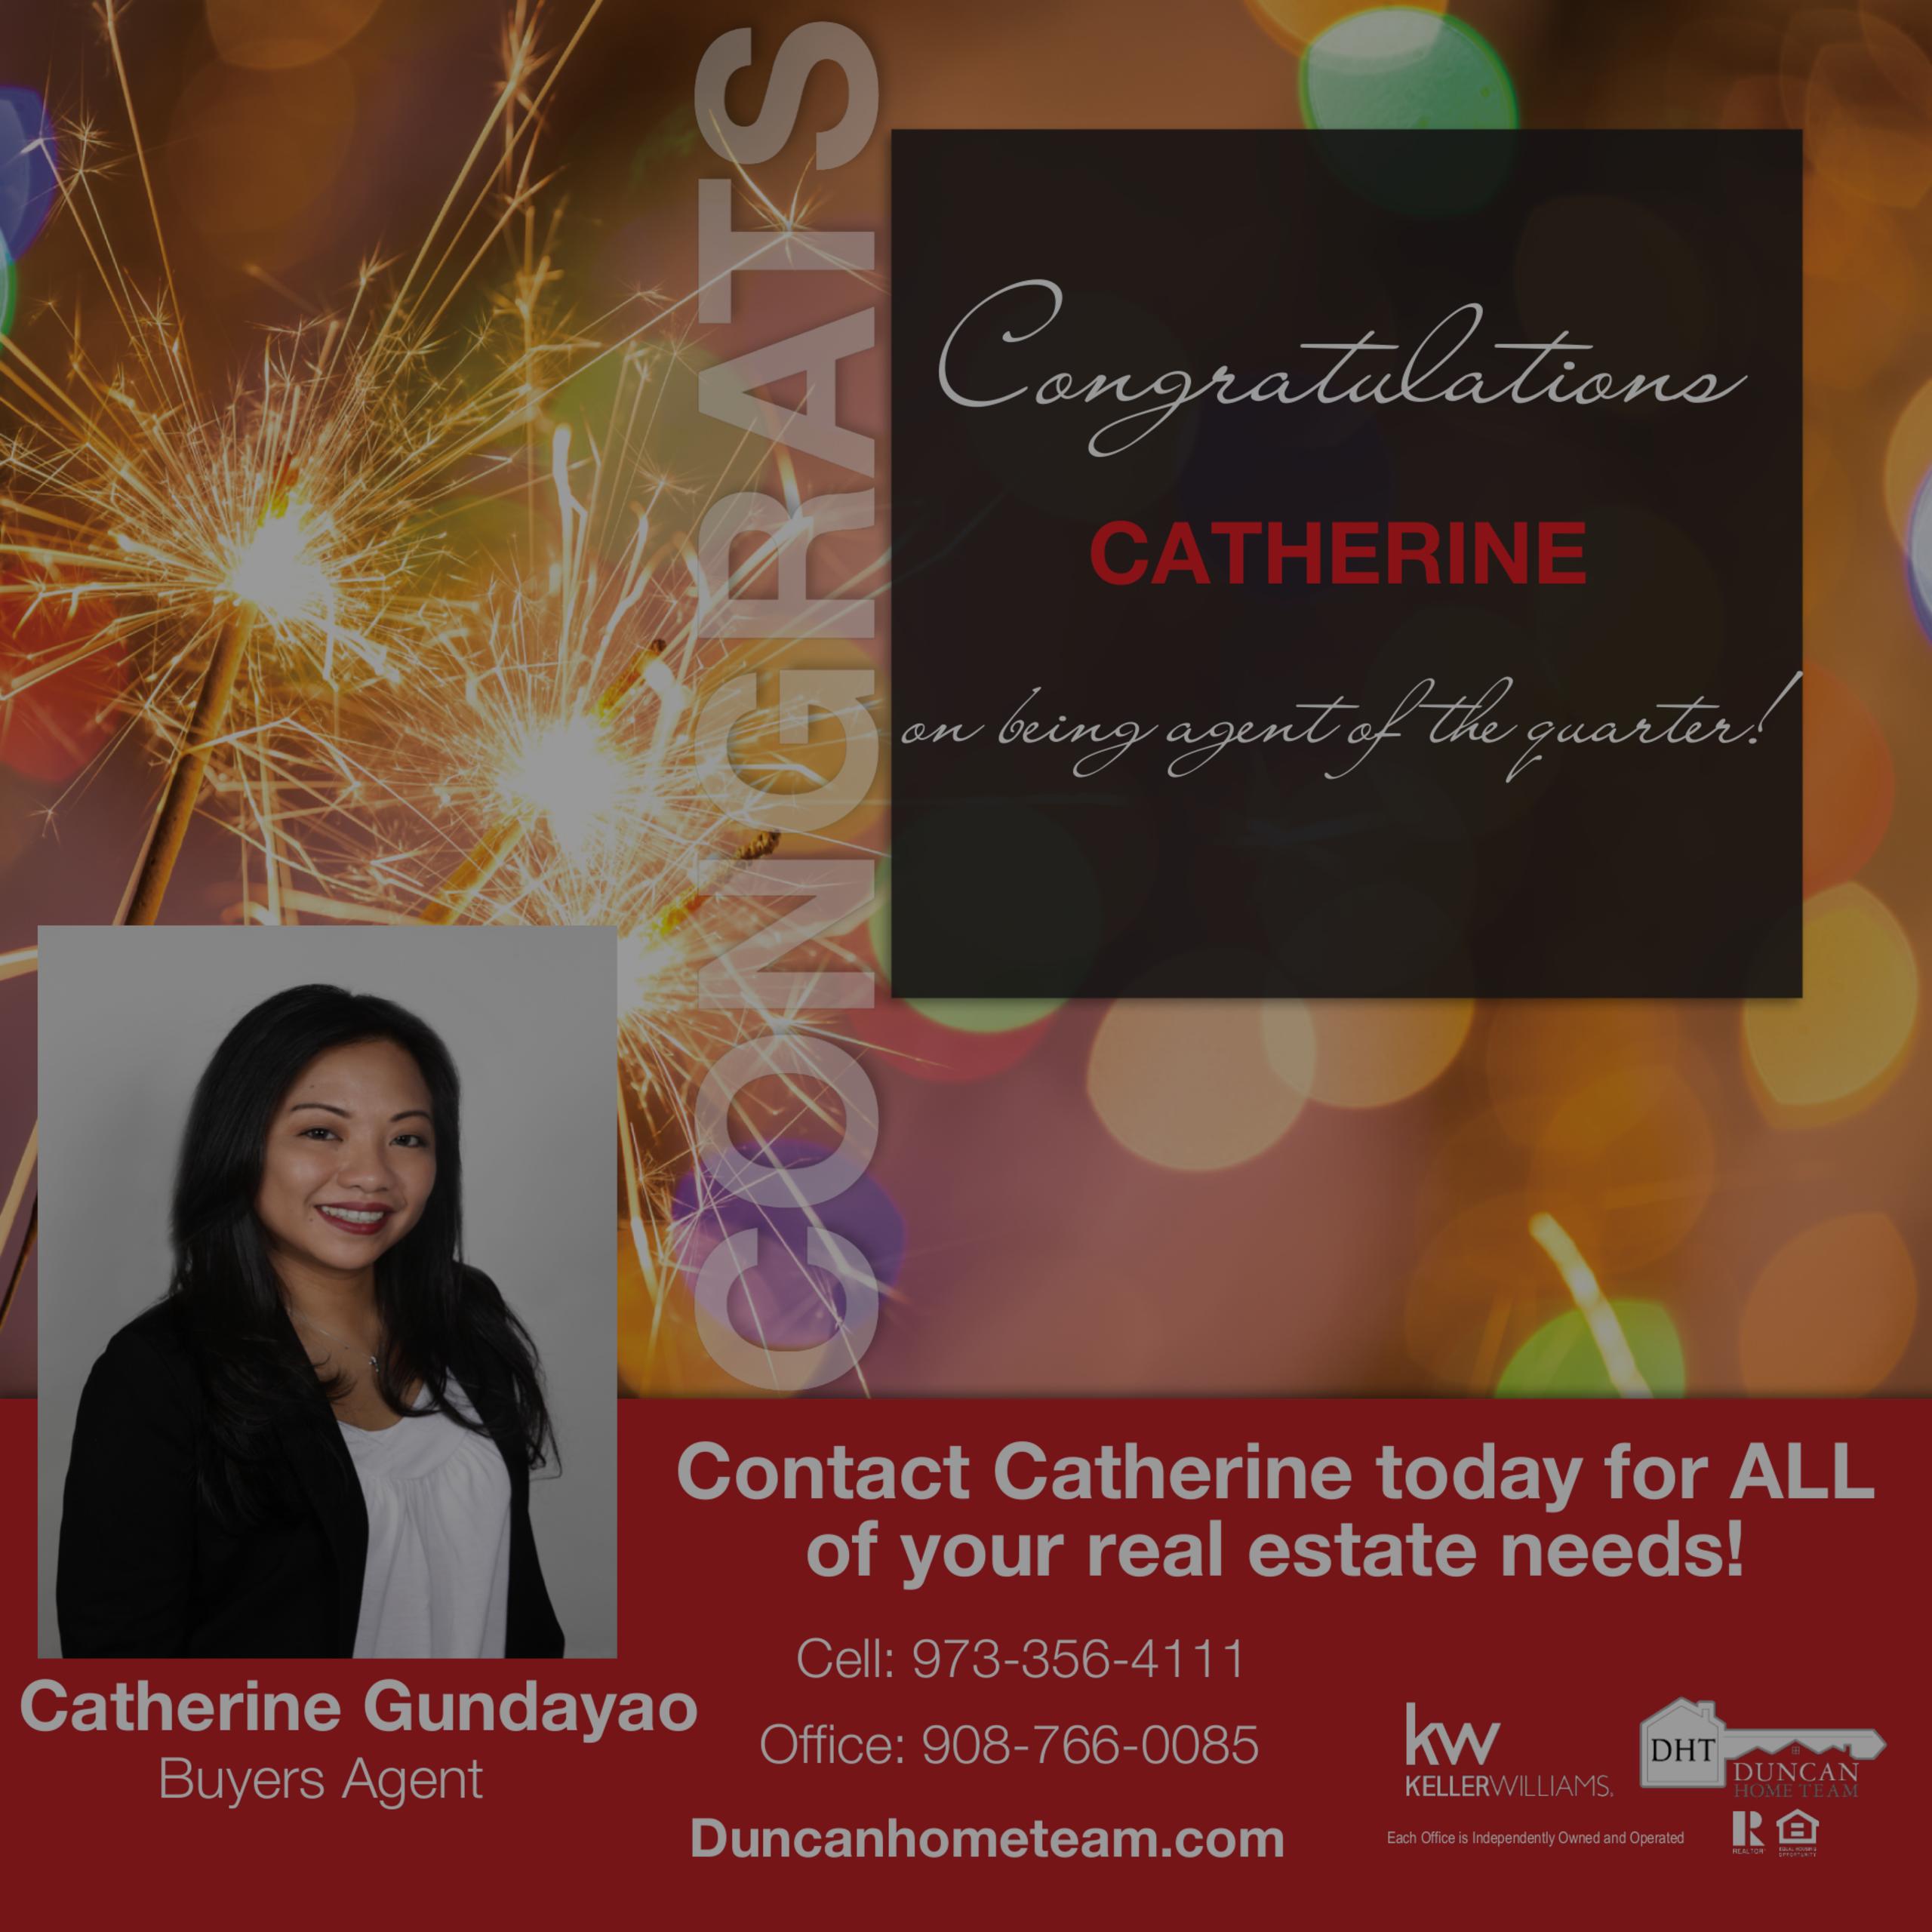 Congrats Catherine!